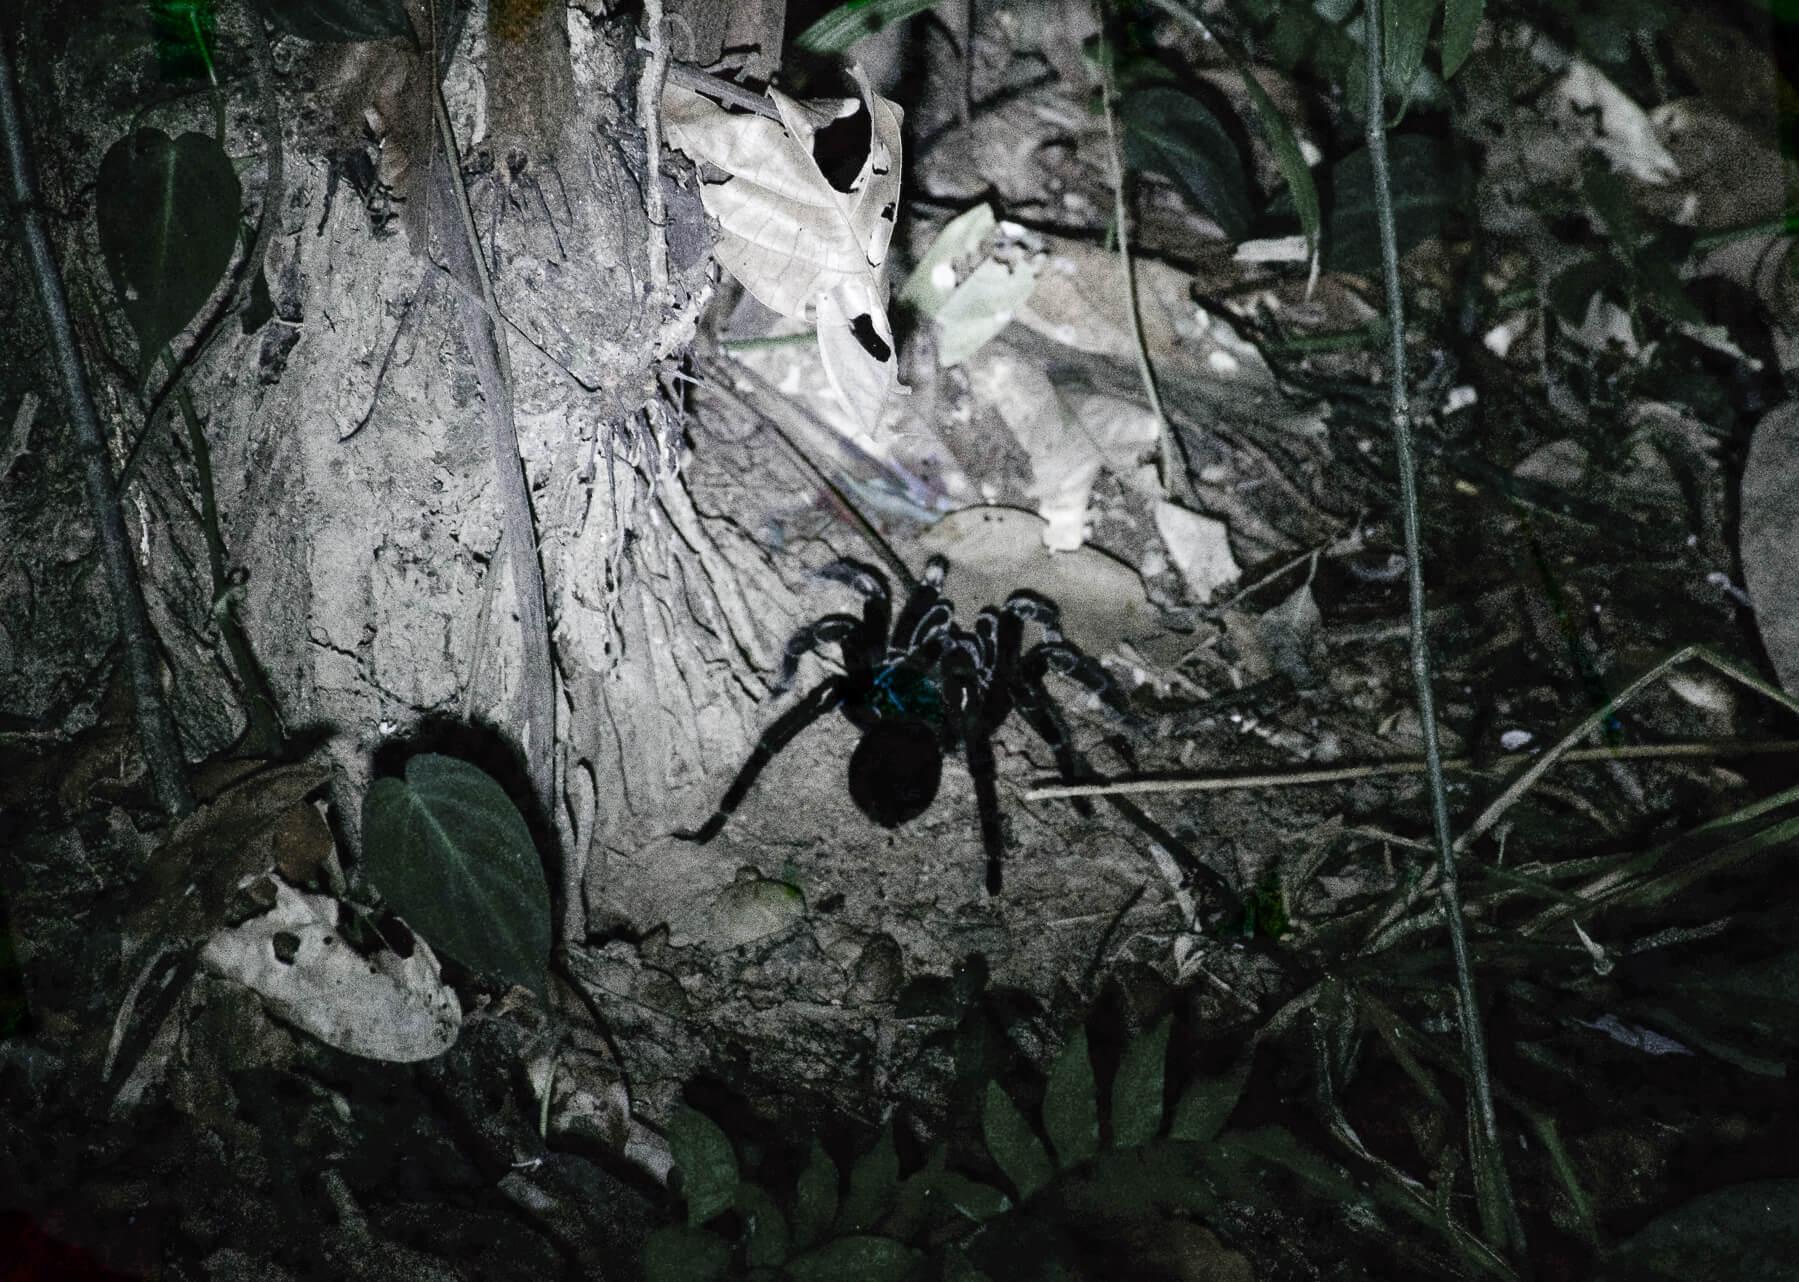 A huge black Chicken Tarantula next to a tree trunk in the dark